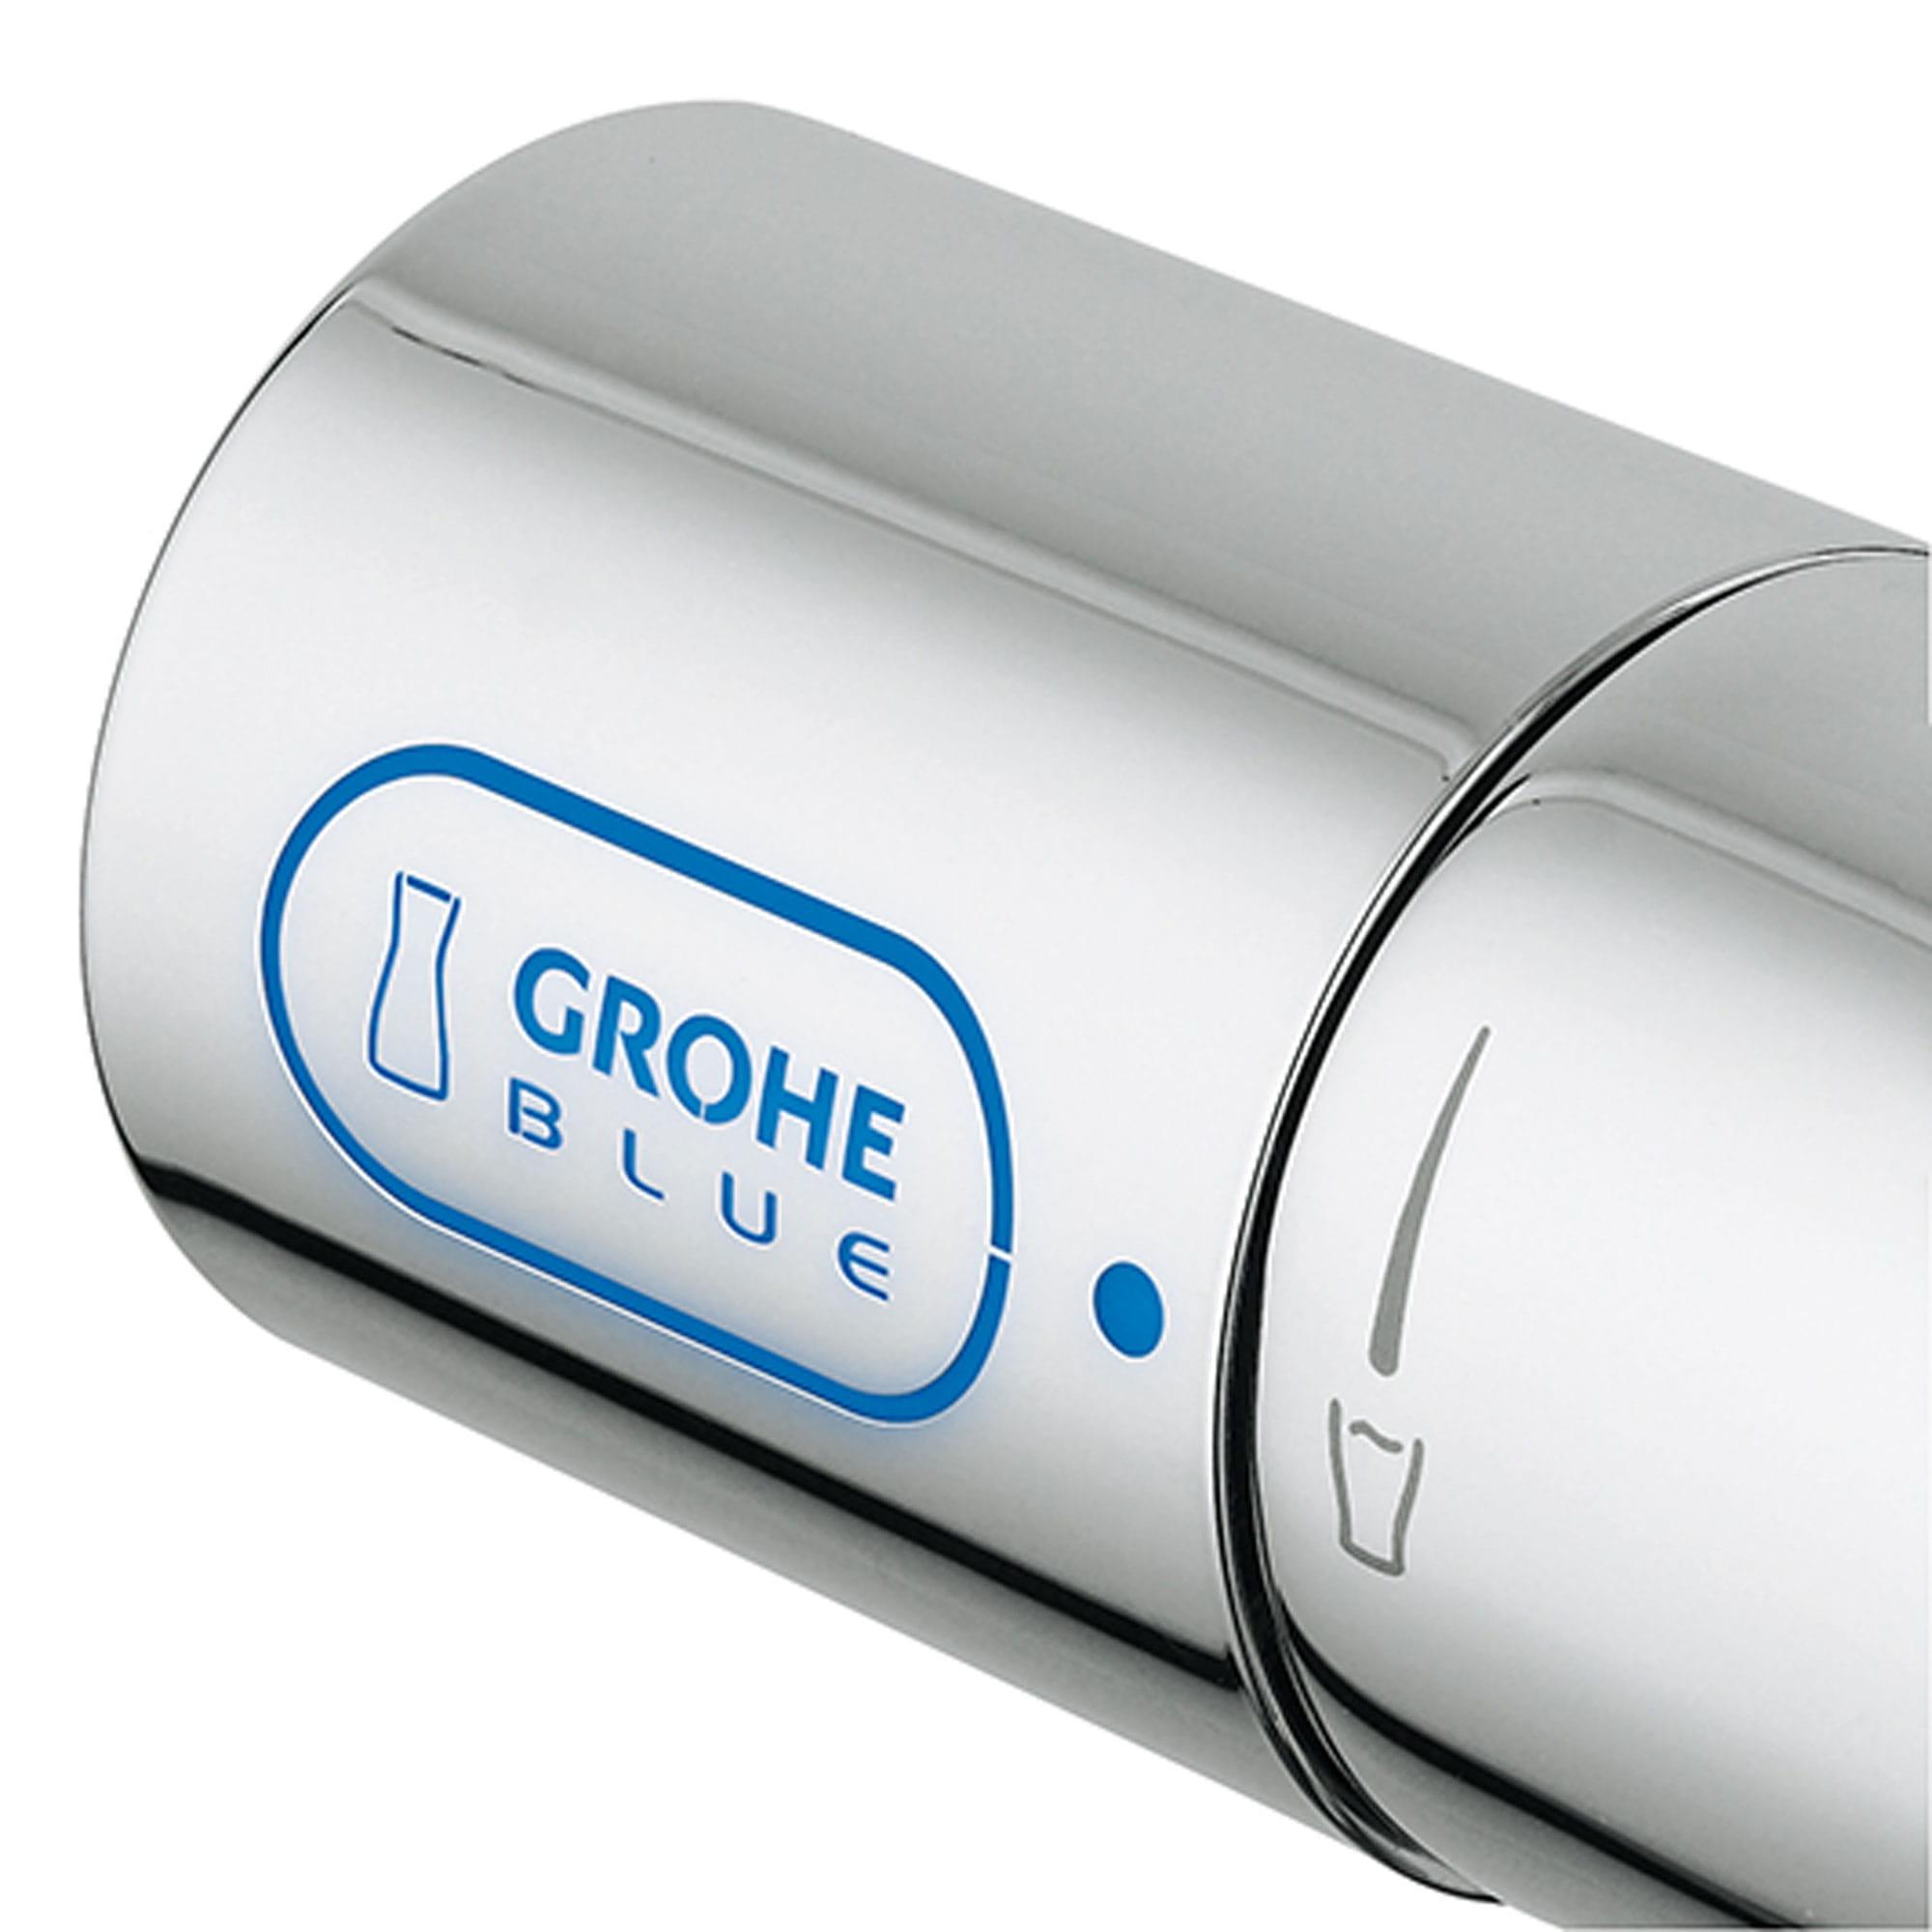 closeup on Grohe Blue turn knob